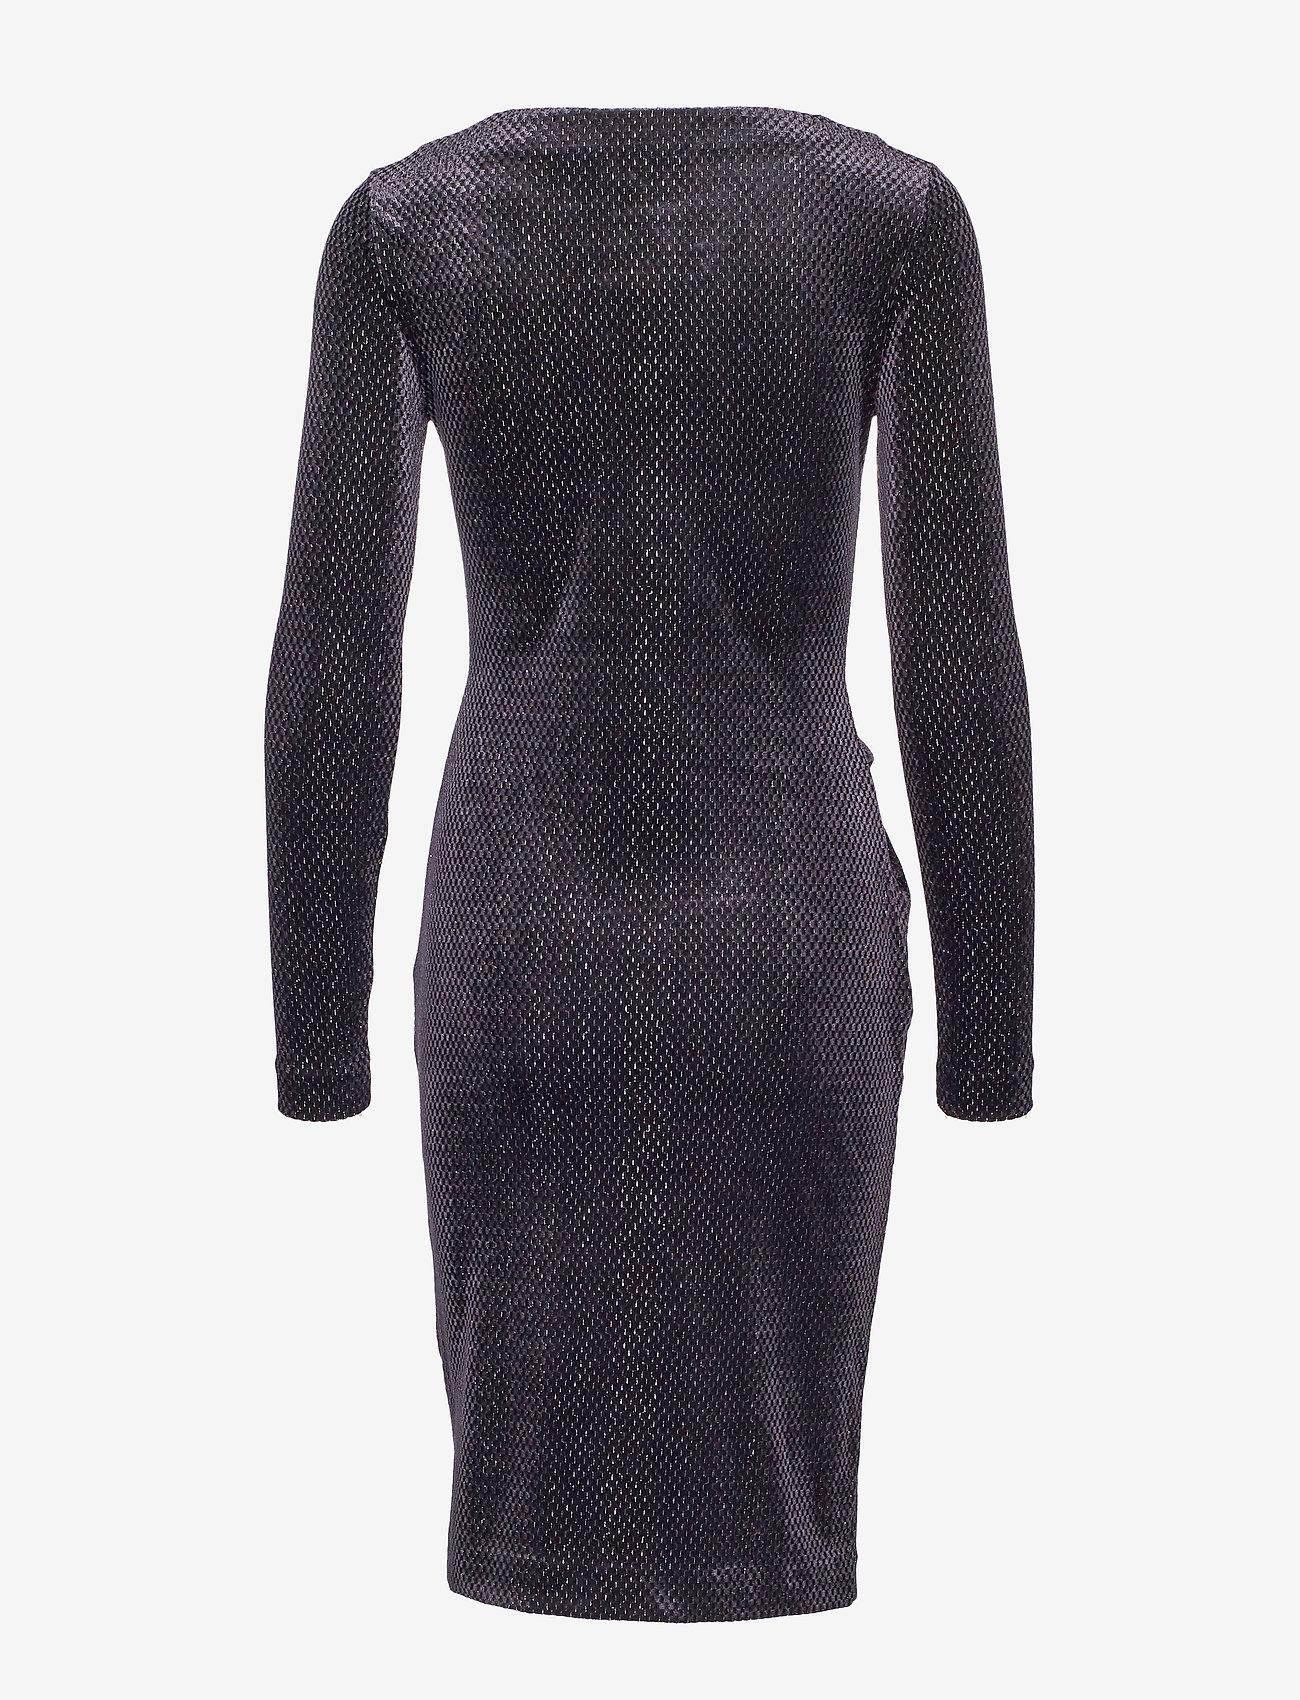 Inwear Onoiw Drape Dress - Dresses